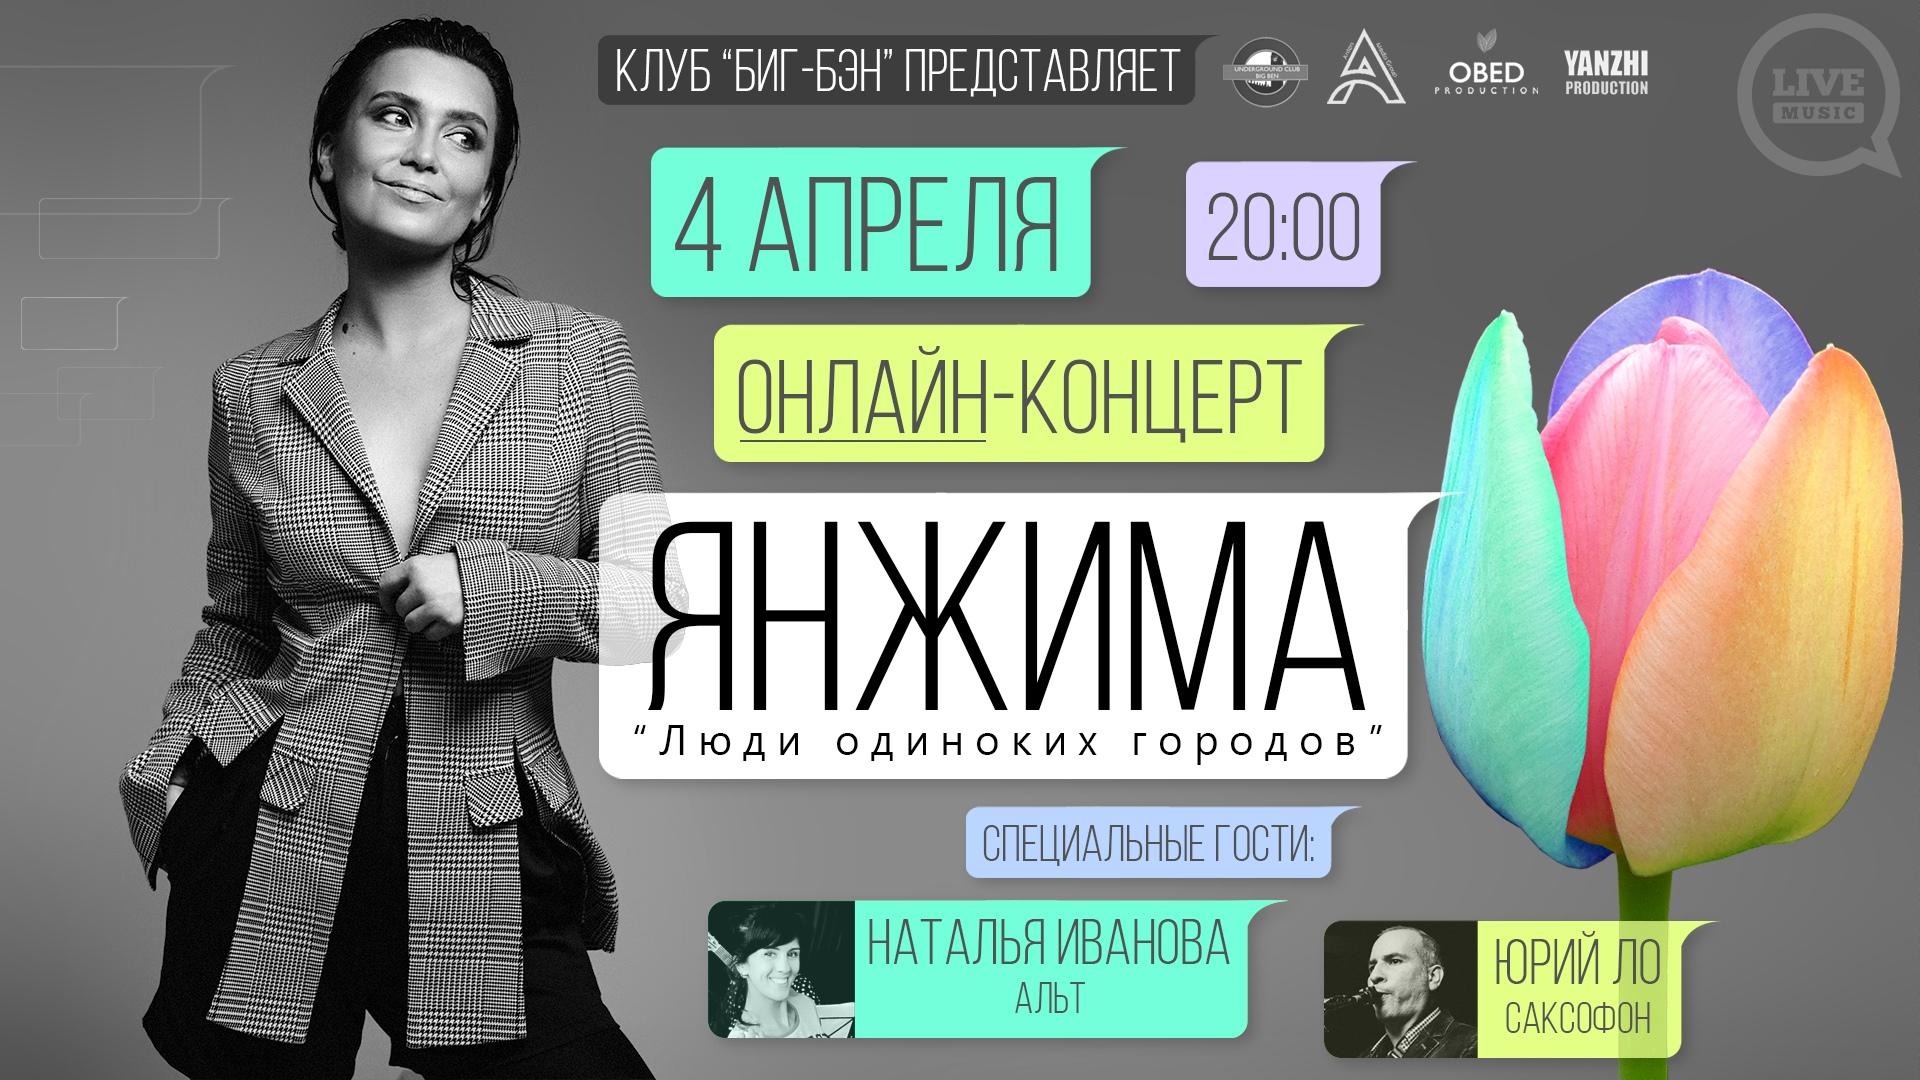 Тверская группа Янжима даст онлайн-концерт